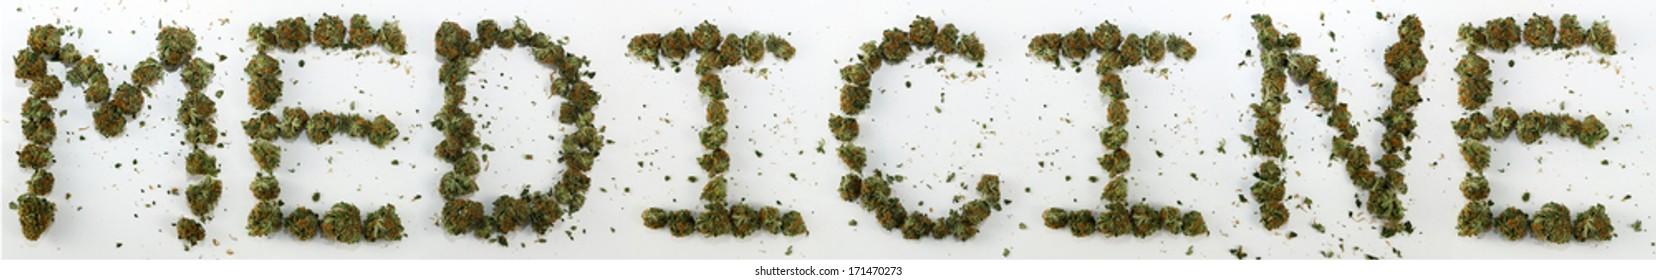 "Medicine Spelled With Marijuana. The word ""Medicine"" spelled out with real marijuana."